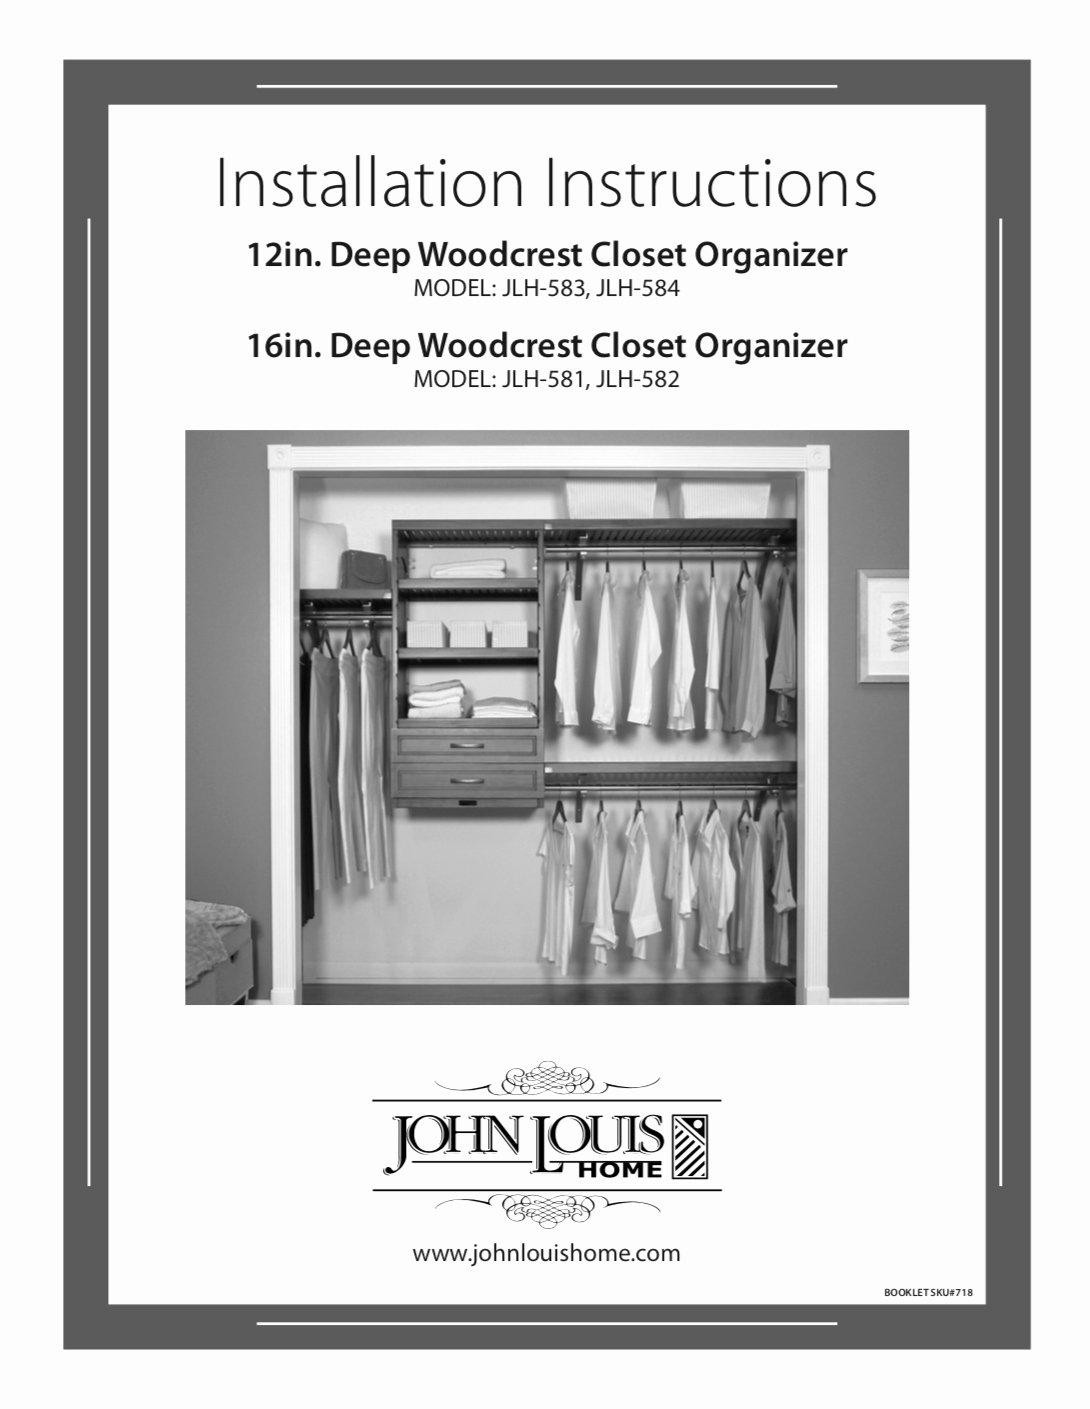 Wiring Instructions Template Best Of 12in Deep Woodcrest organizer